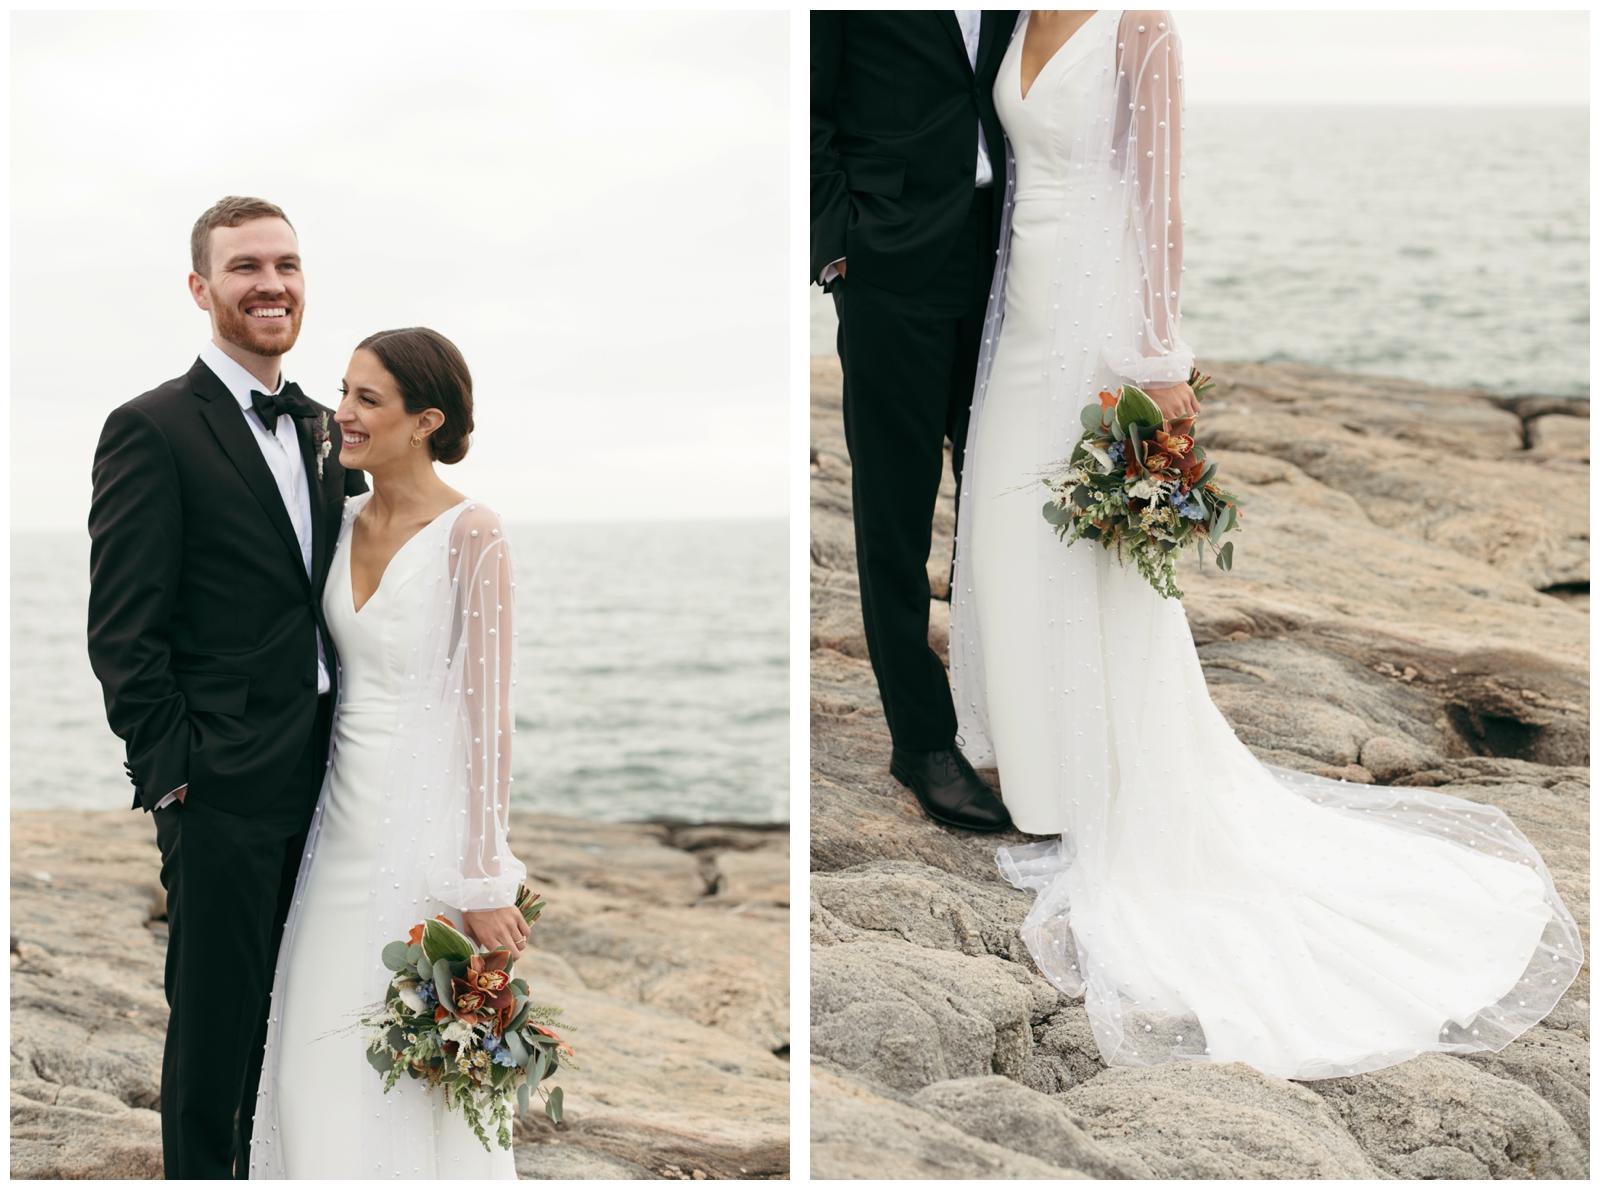 Madison-Beach-Hotel-Wedding-Bailey-Q-Photo-Boston-Wedding-Photographer-008.jpg